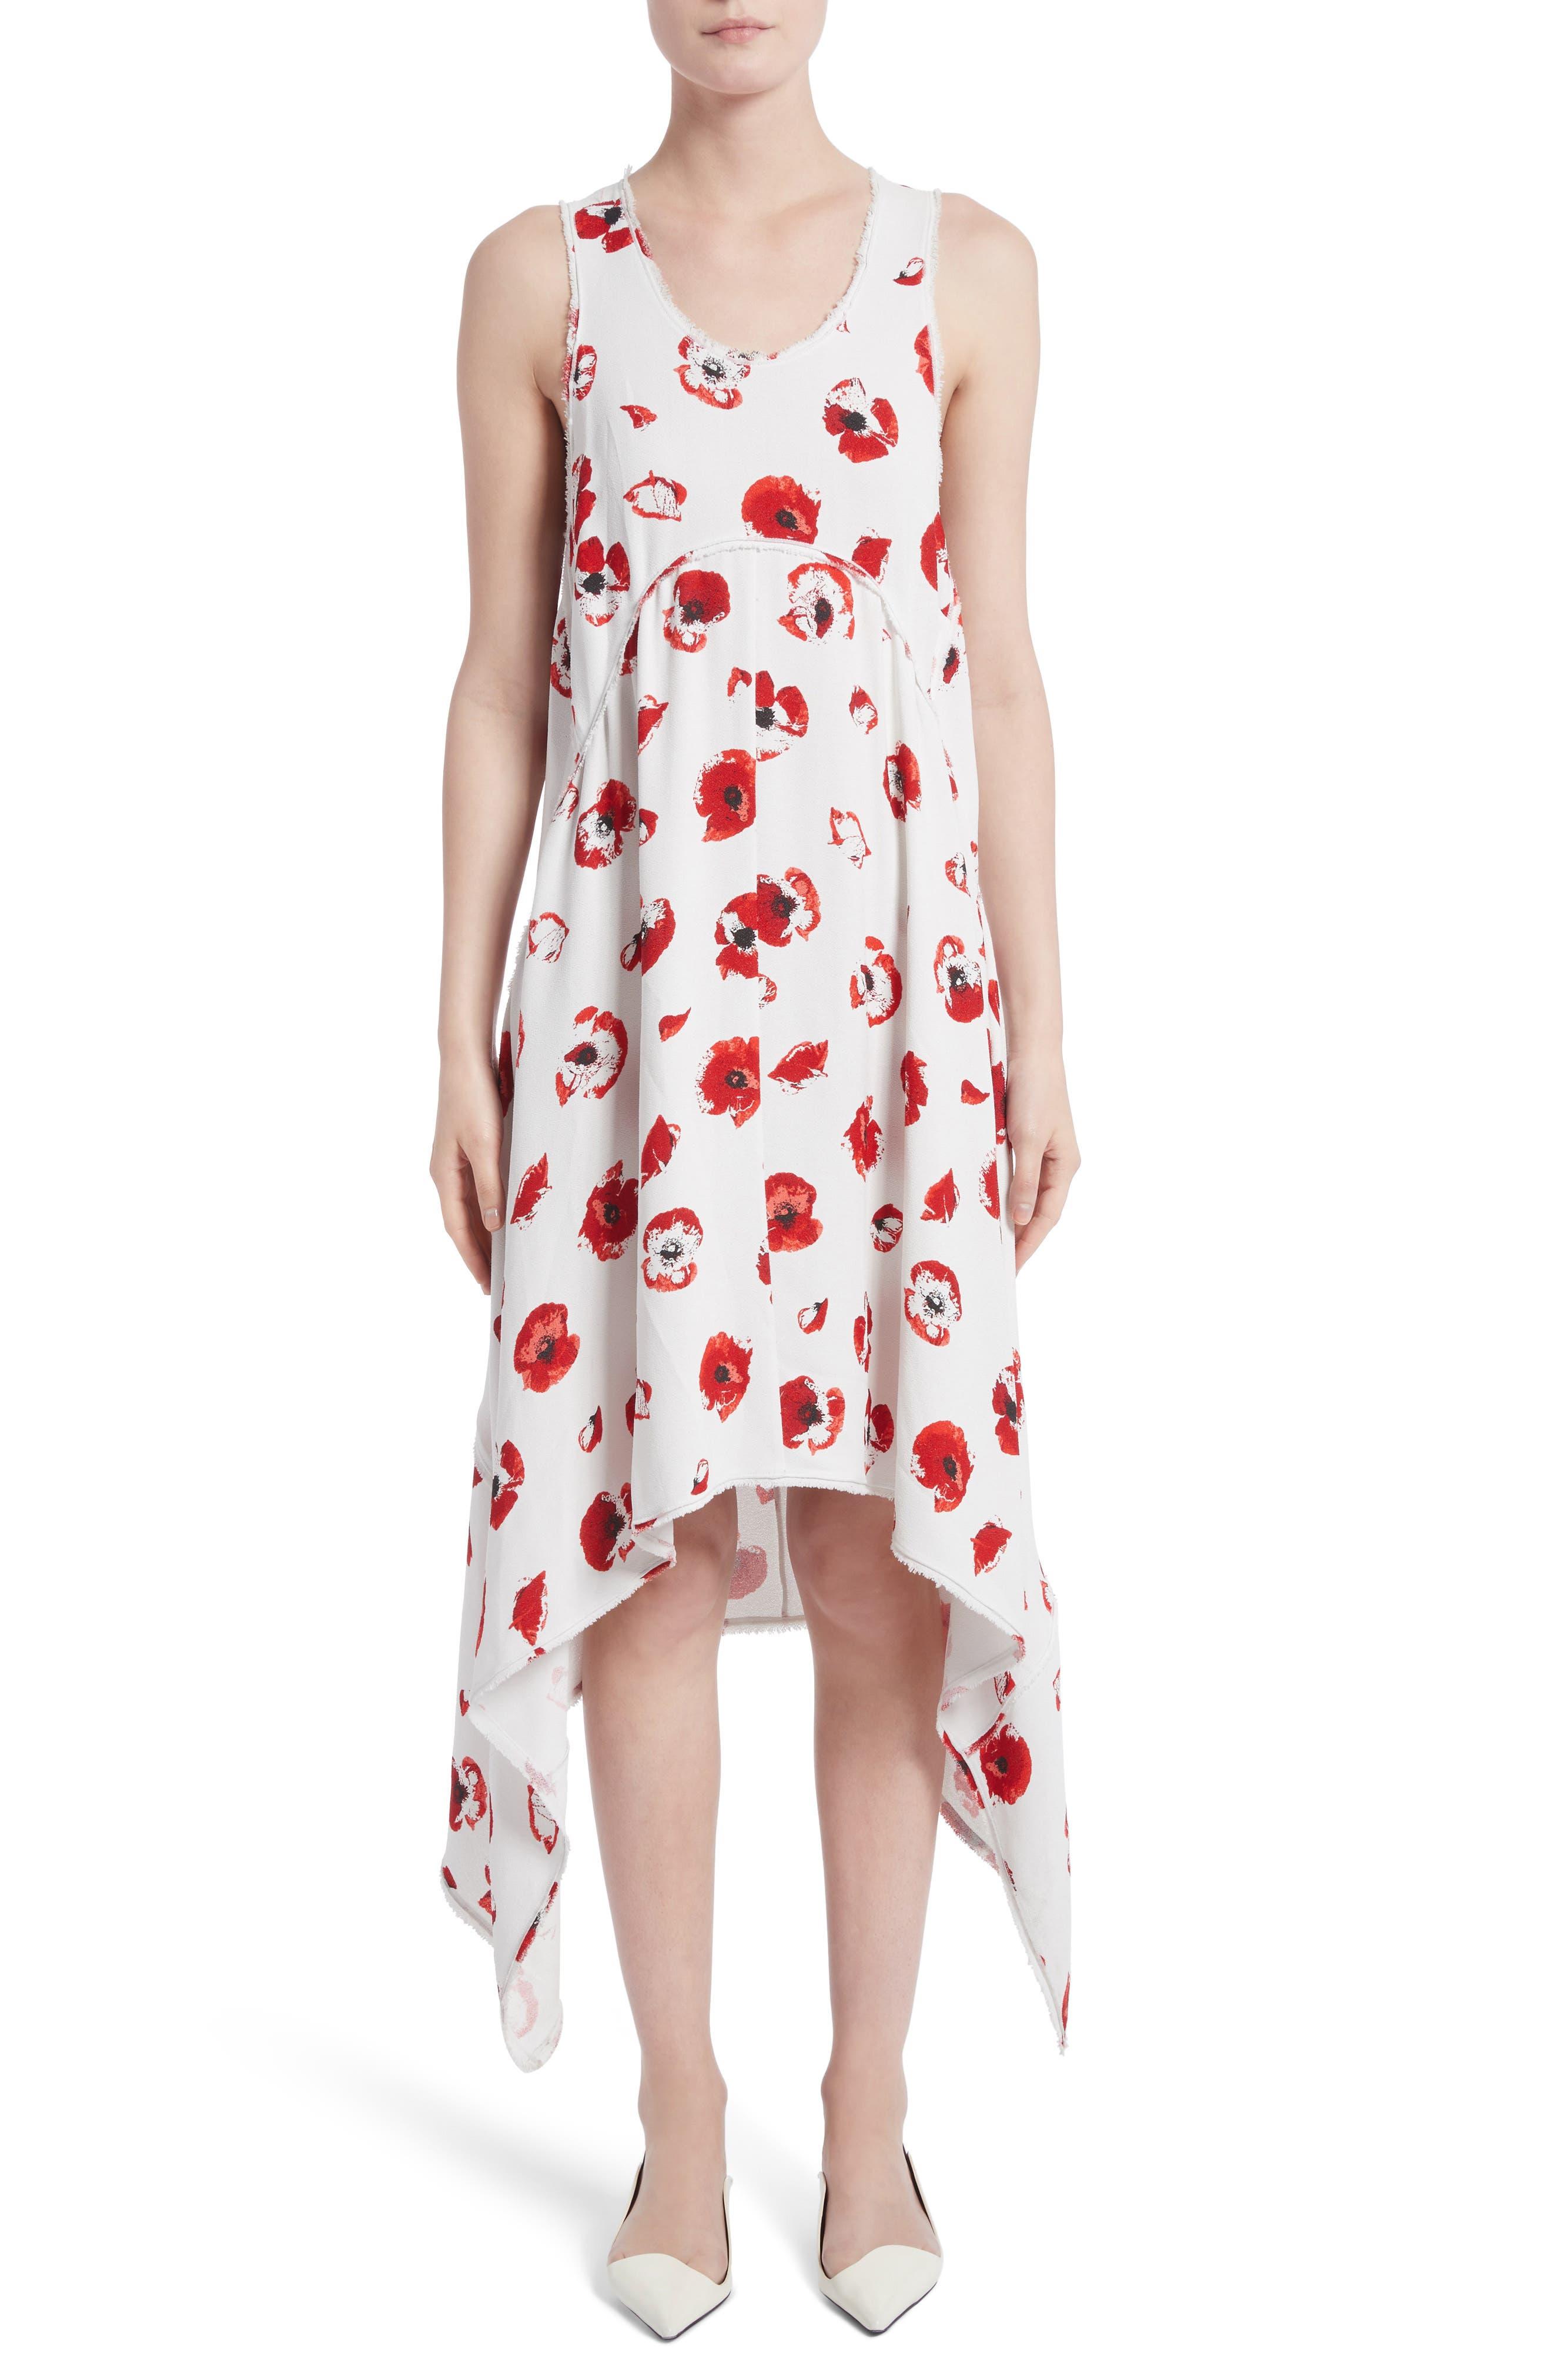 Proenza Schouler Floral Print Handkerchief Hem Dress